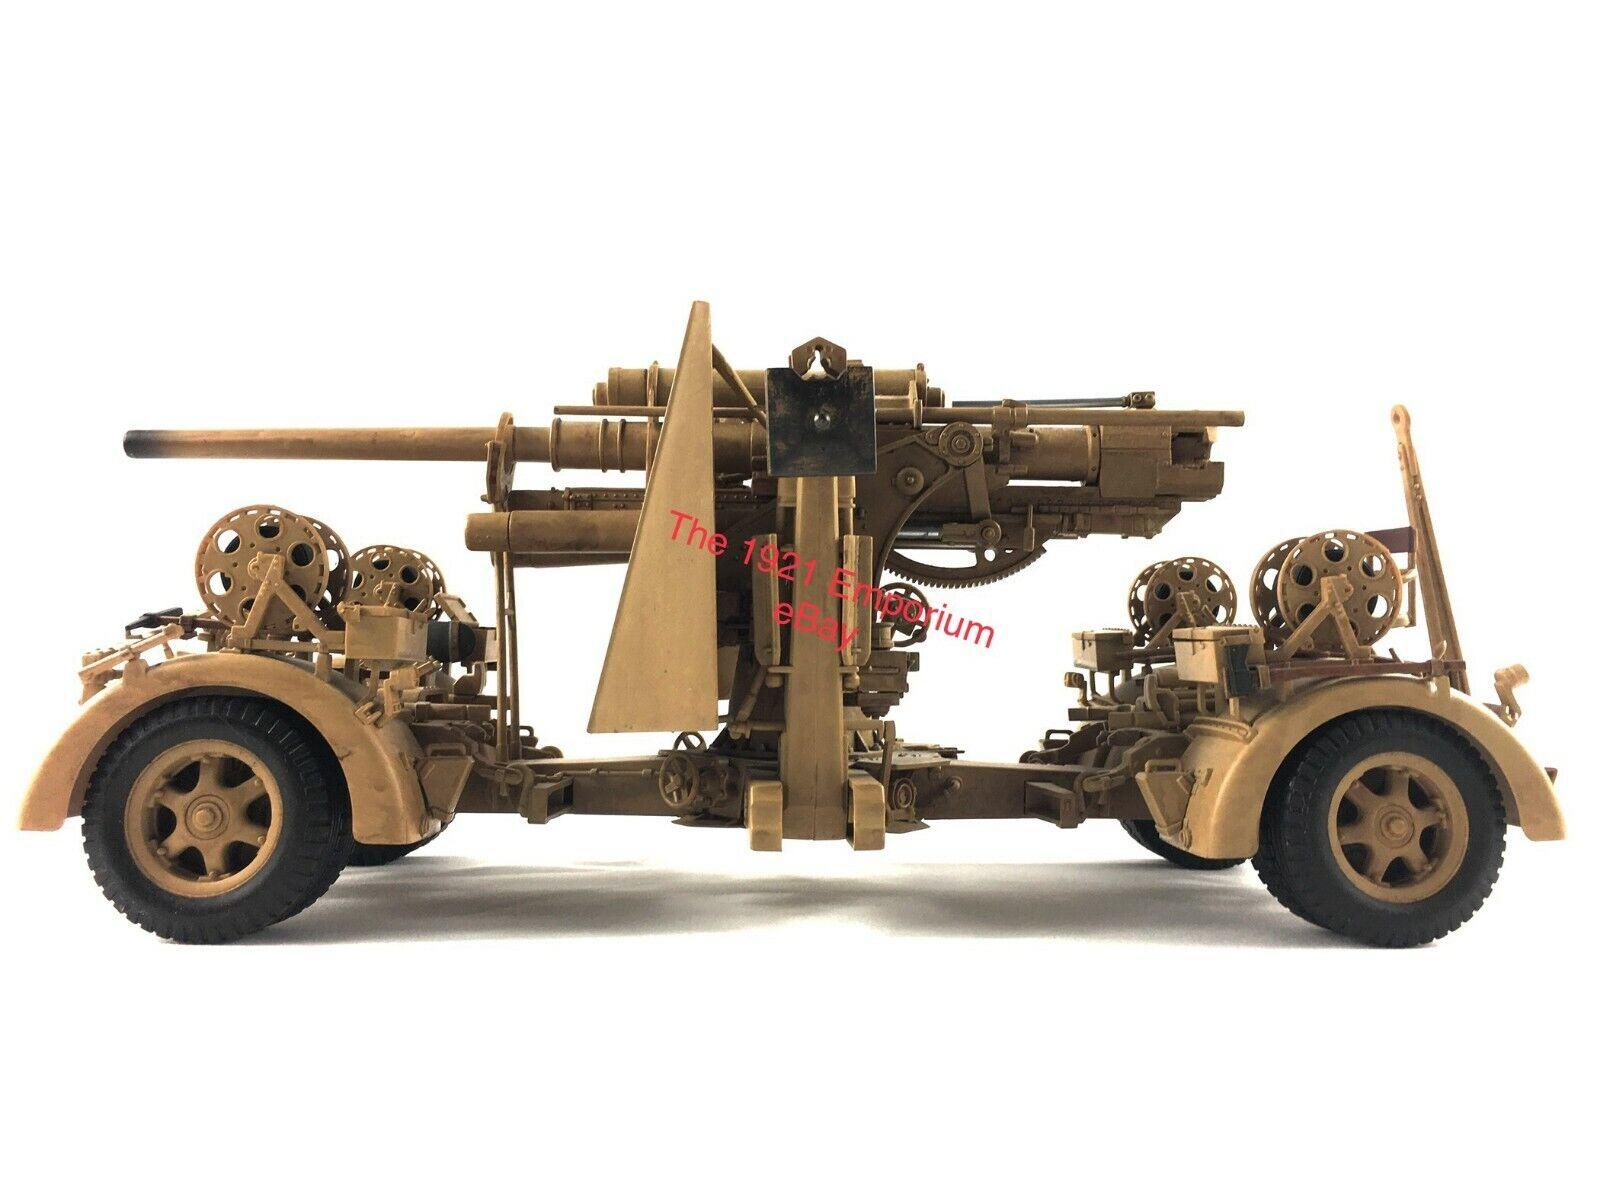 1 18 21st CENTURY TOYS Ultimate Soldier WWII Gerhomme  Afrika Afrikakorps 88 mm Flak Gun  abordable